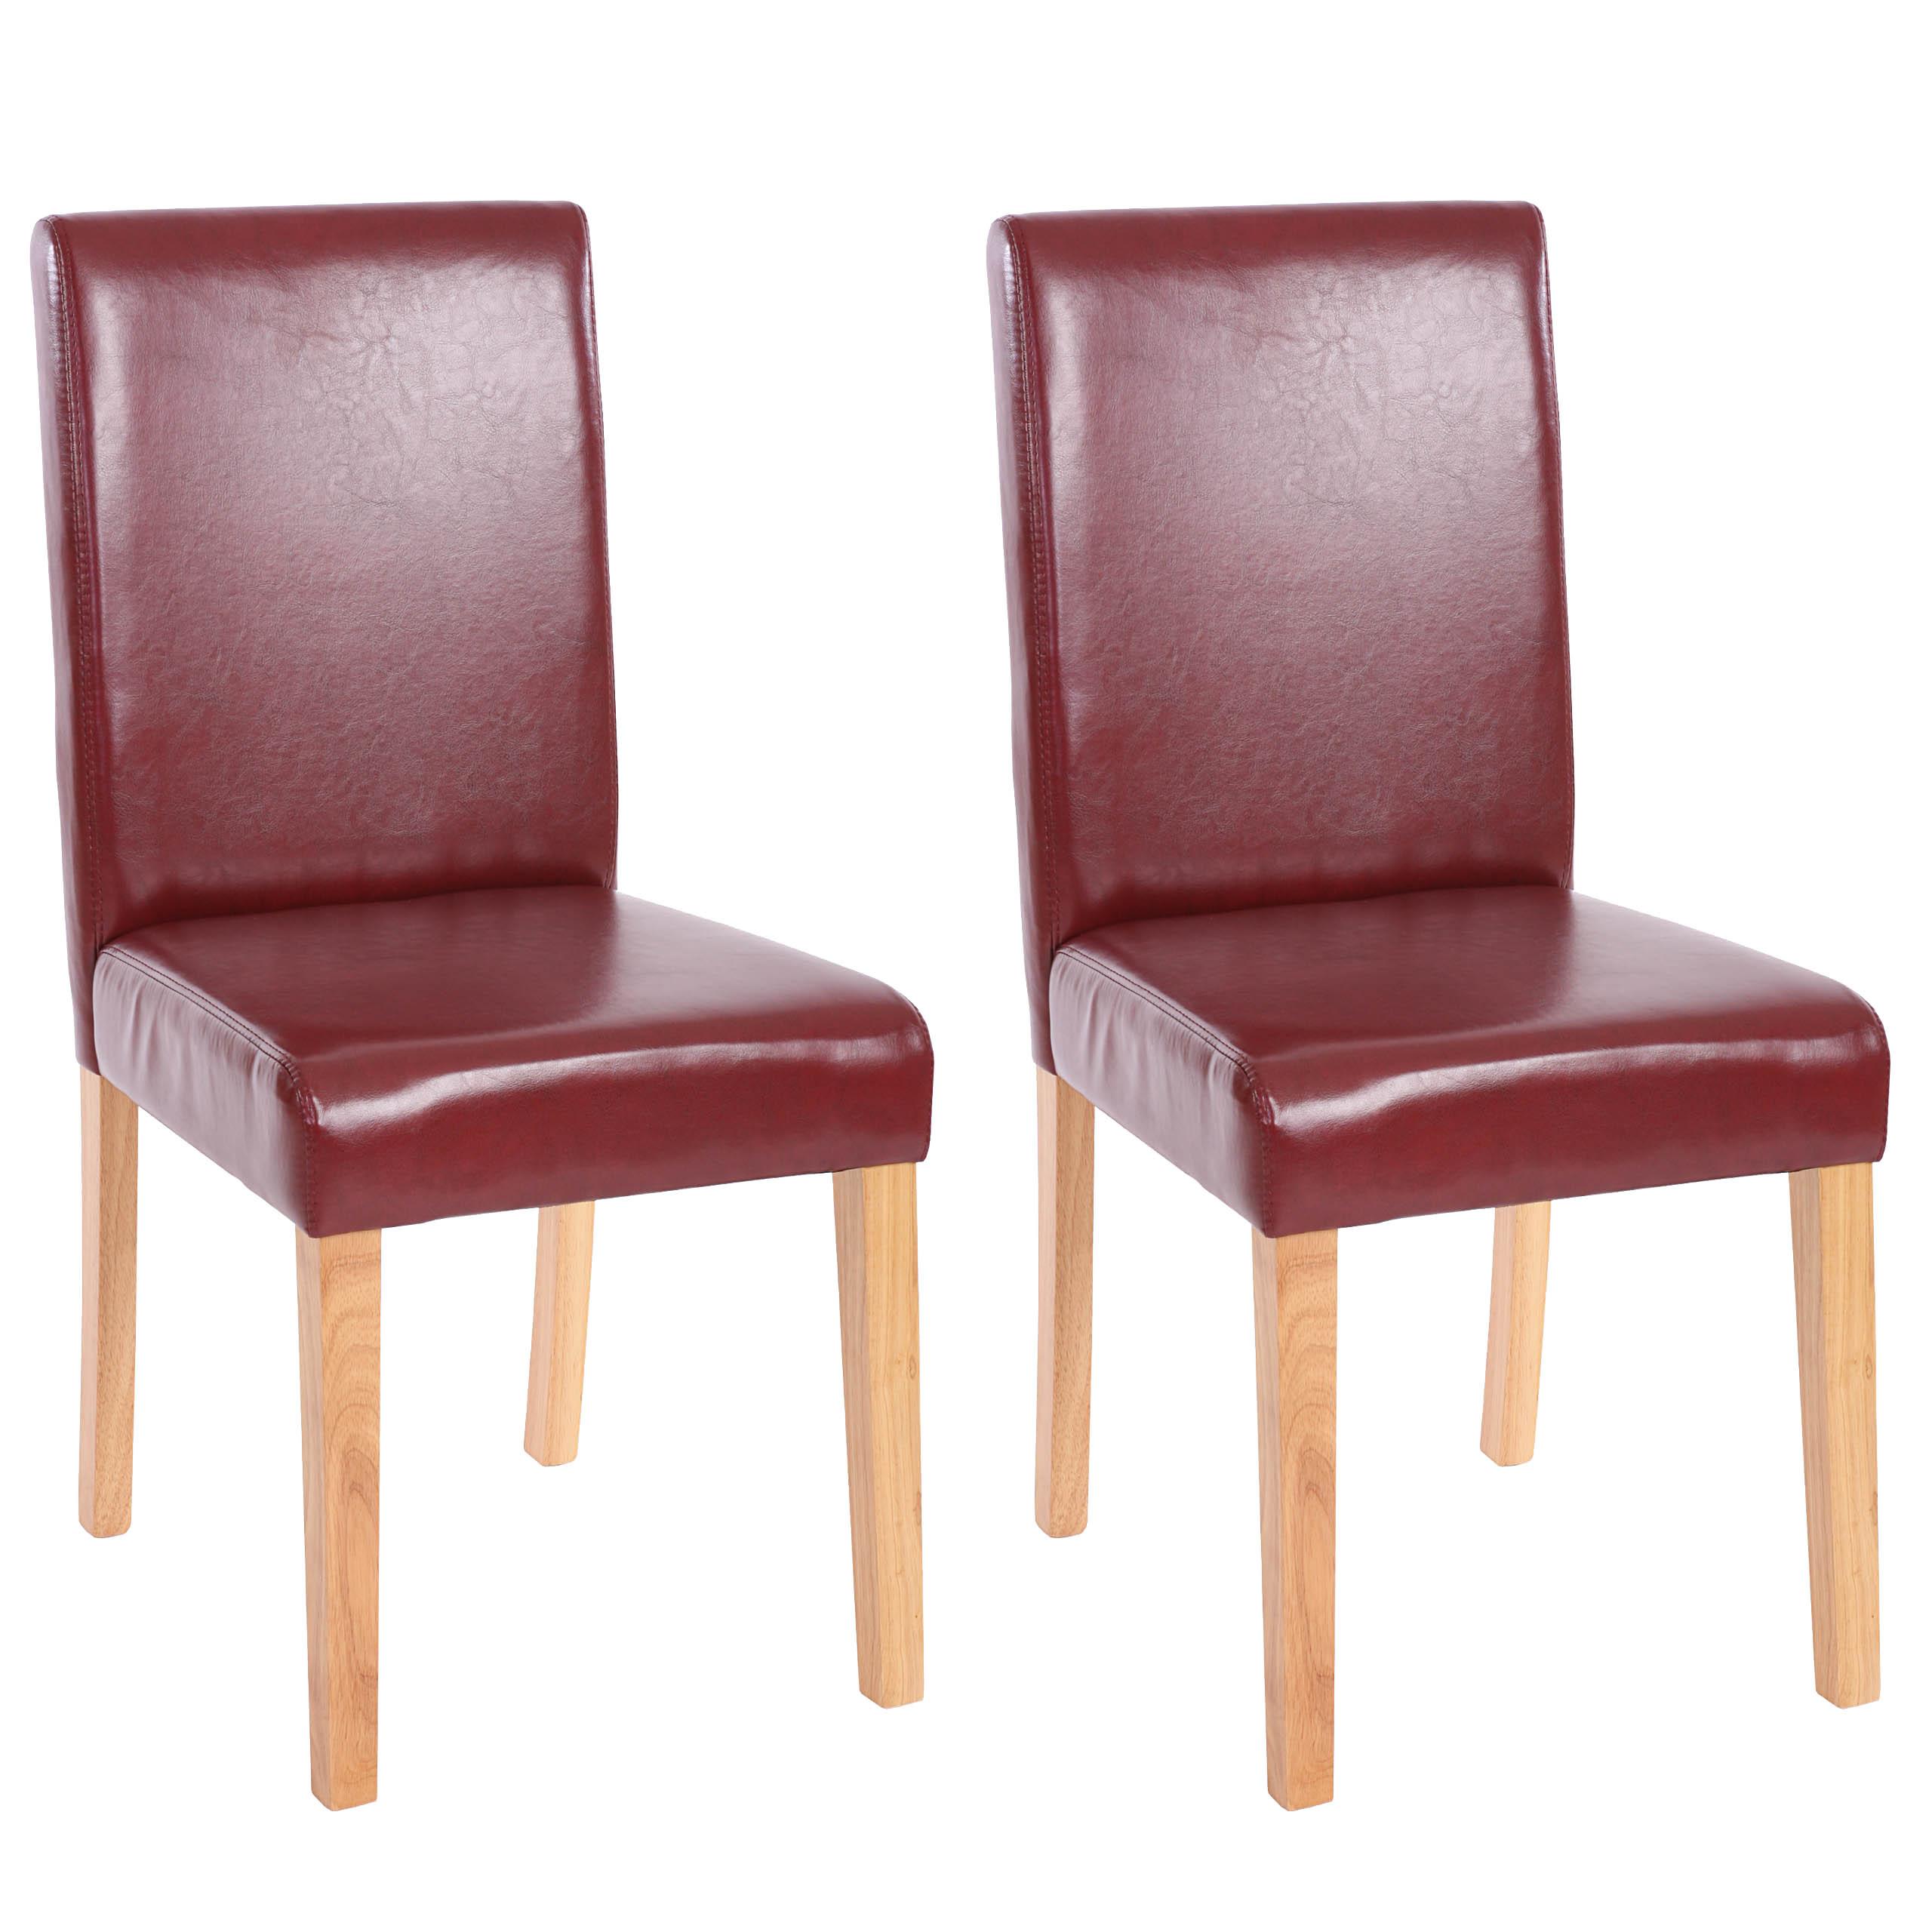 6x esszimmerstuhl stuhl lehnstuhl littau kunstleder rot braun helle beine. Black Bedroom Furniture Sets. Home Design Ideas